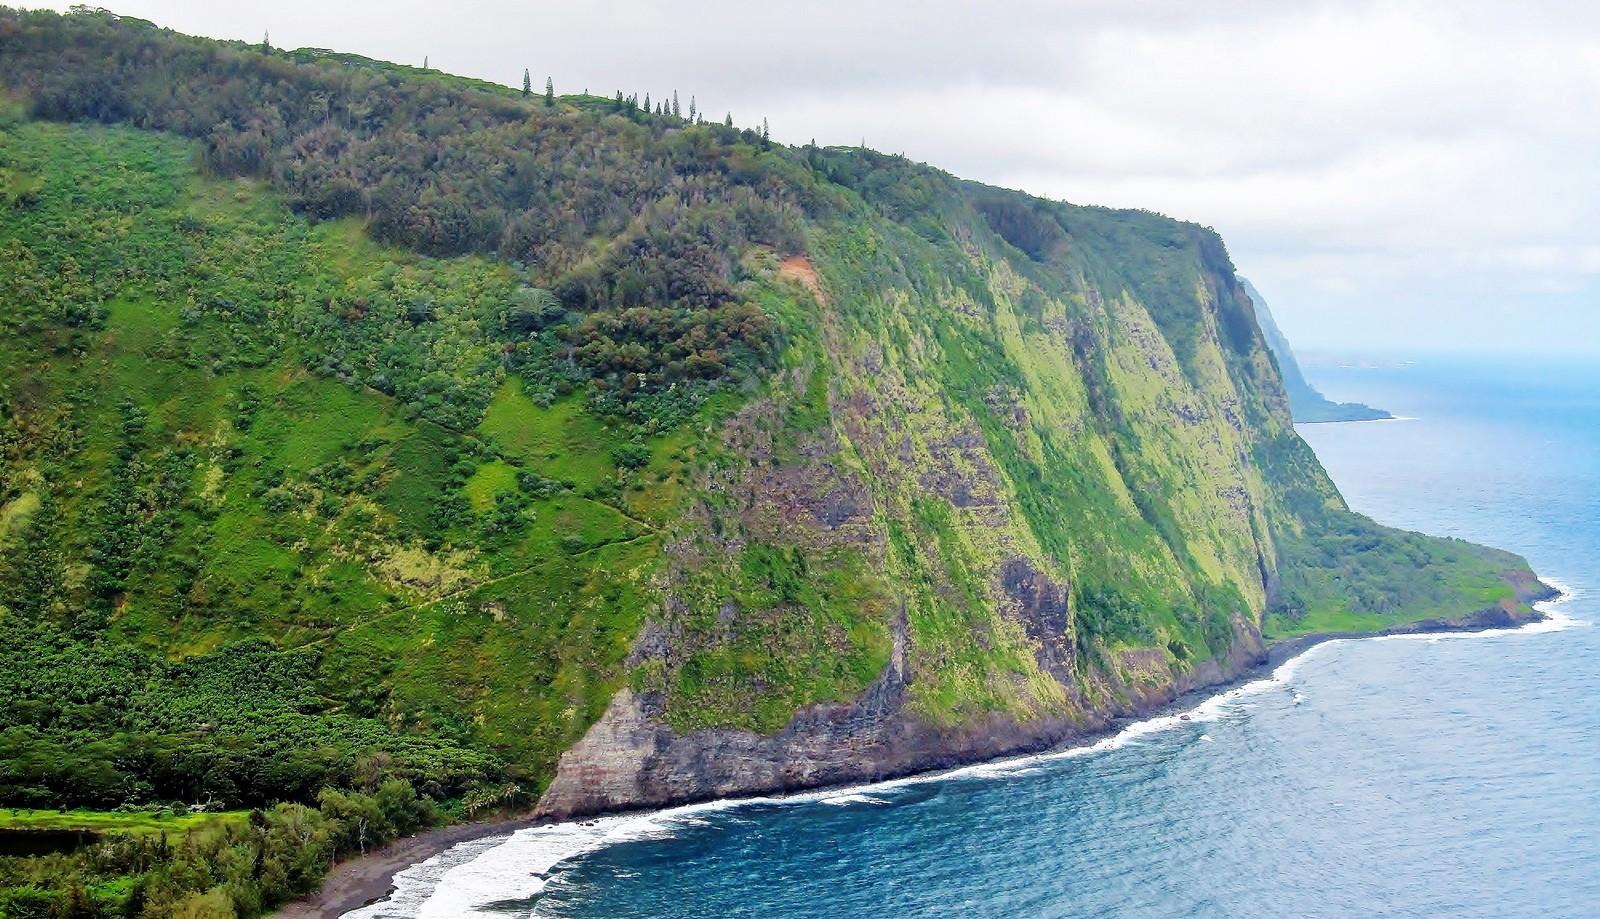 Big Island helicopter tour over Waipi'o Valley